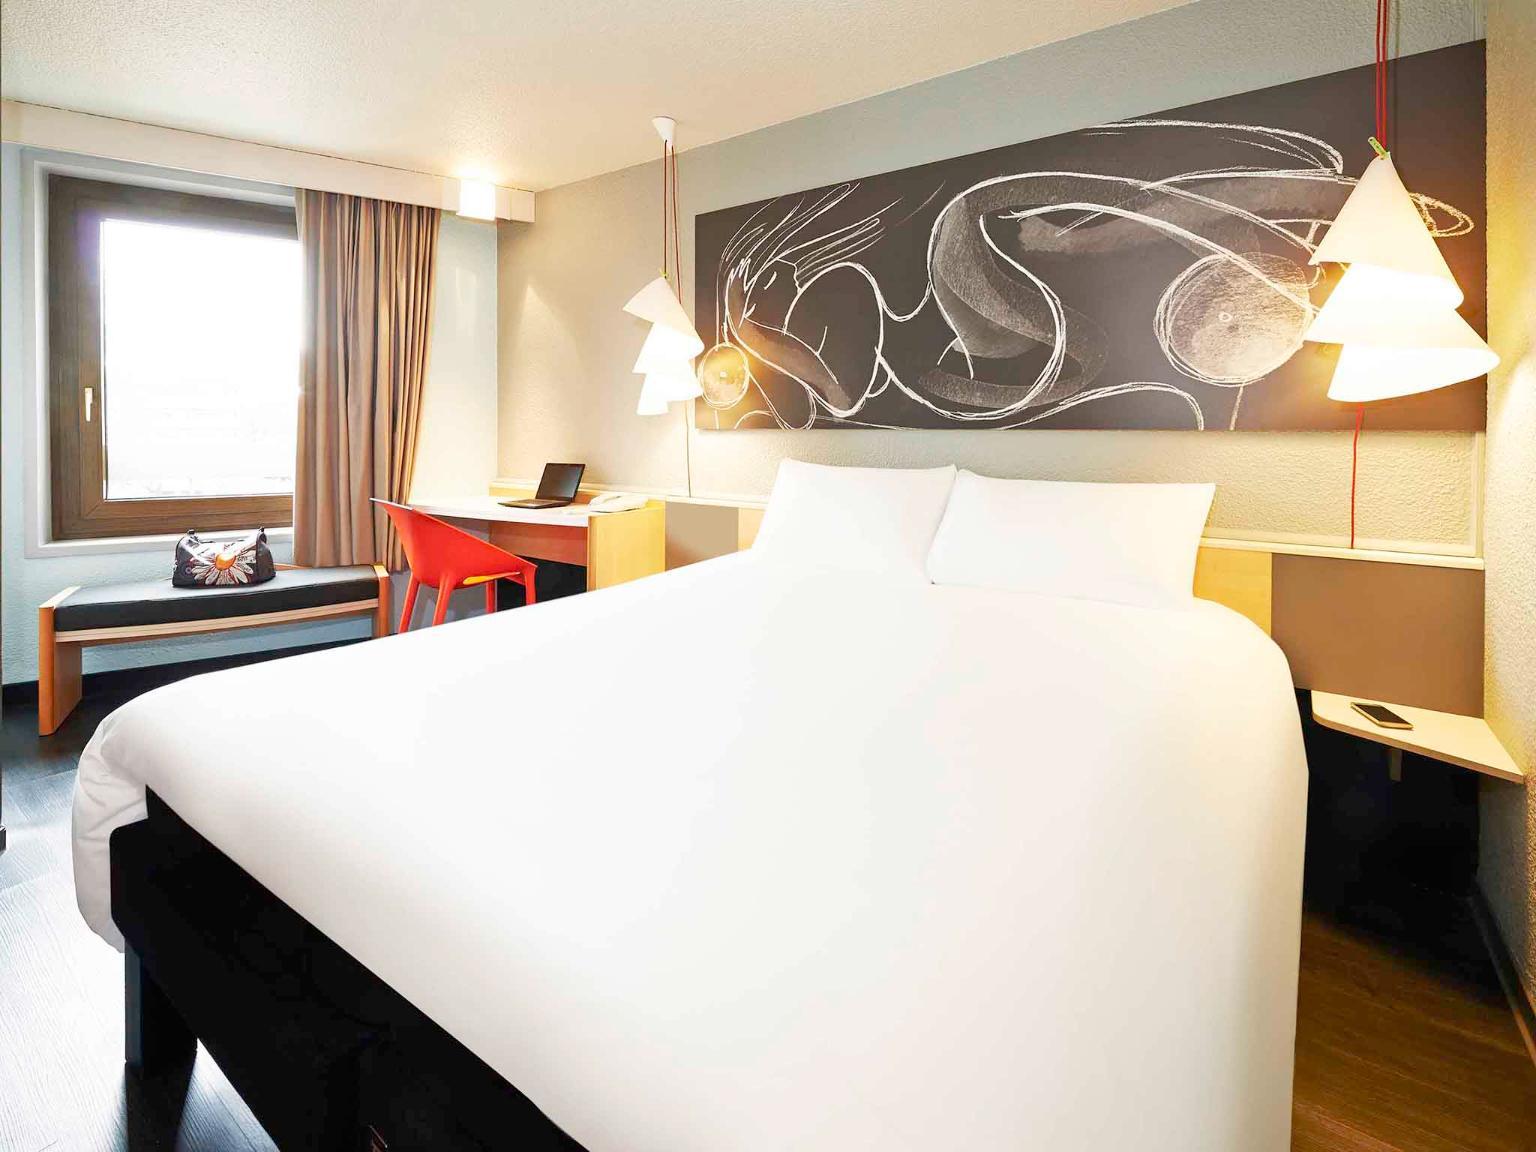 ibis strasbourg centre historique h tel 7 rue de molsheim 67000 strasbourg adresse horaire. Black Bedroom Furniture Sets. Home Design Ideas